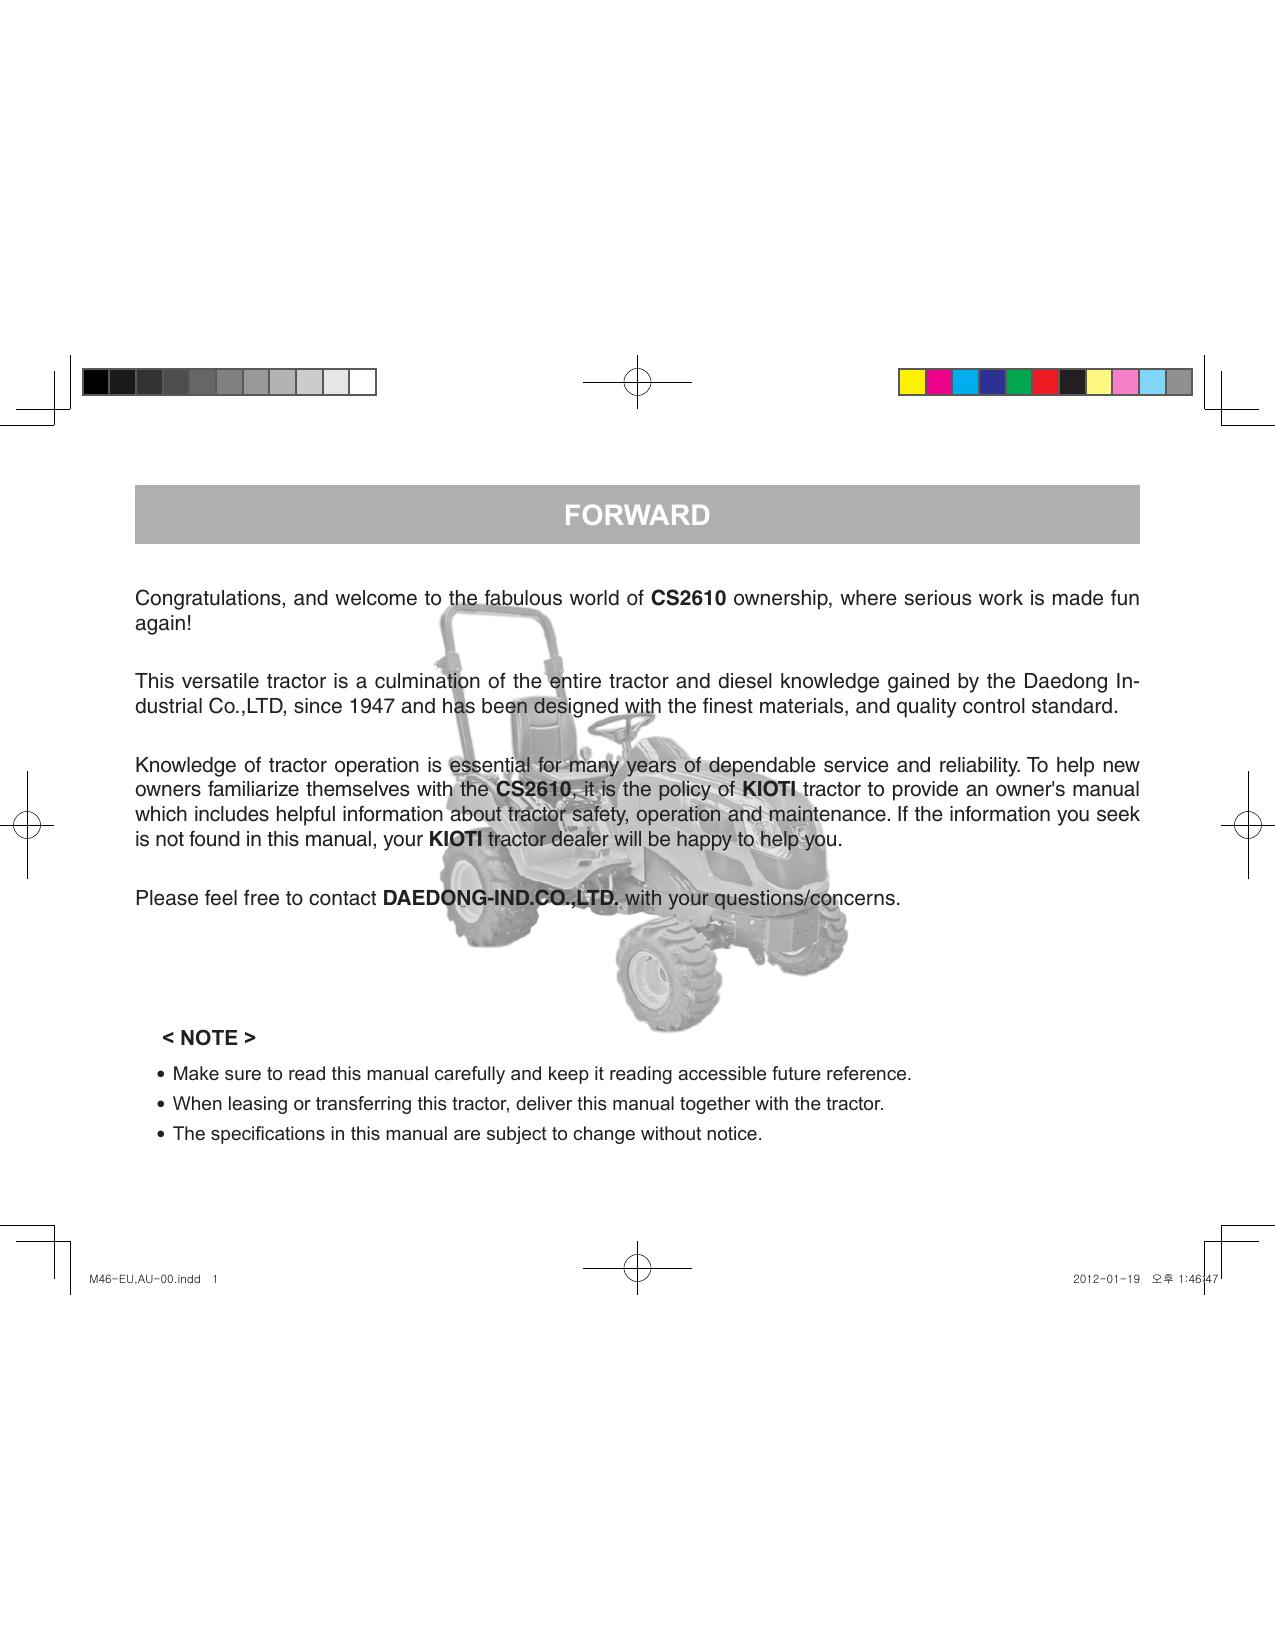 Kioti Cs2610 Manual Manualzz